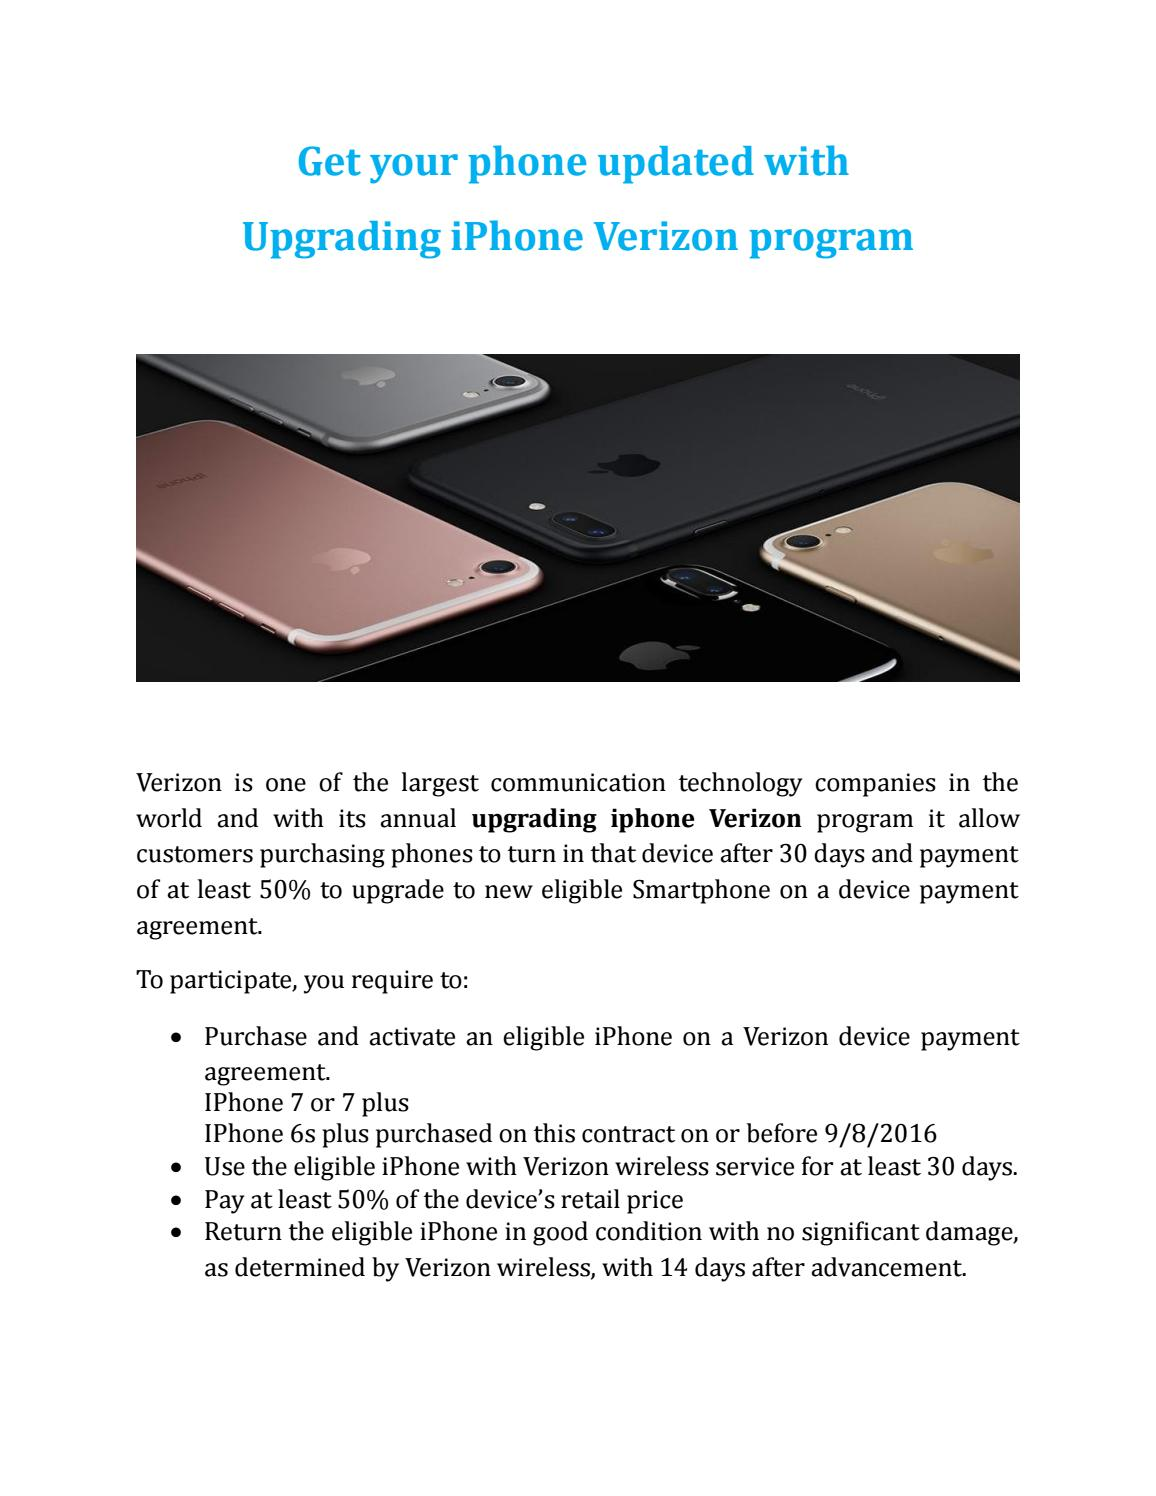 will verizon activate iphone 6